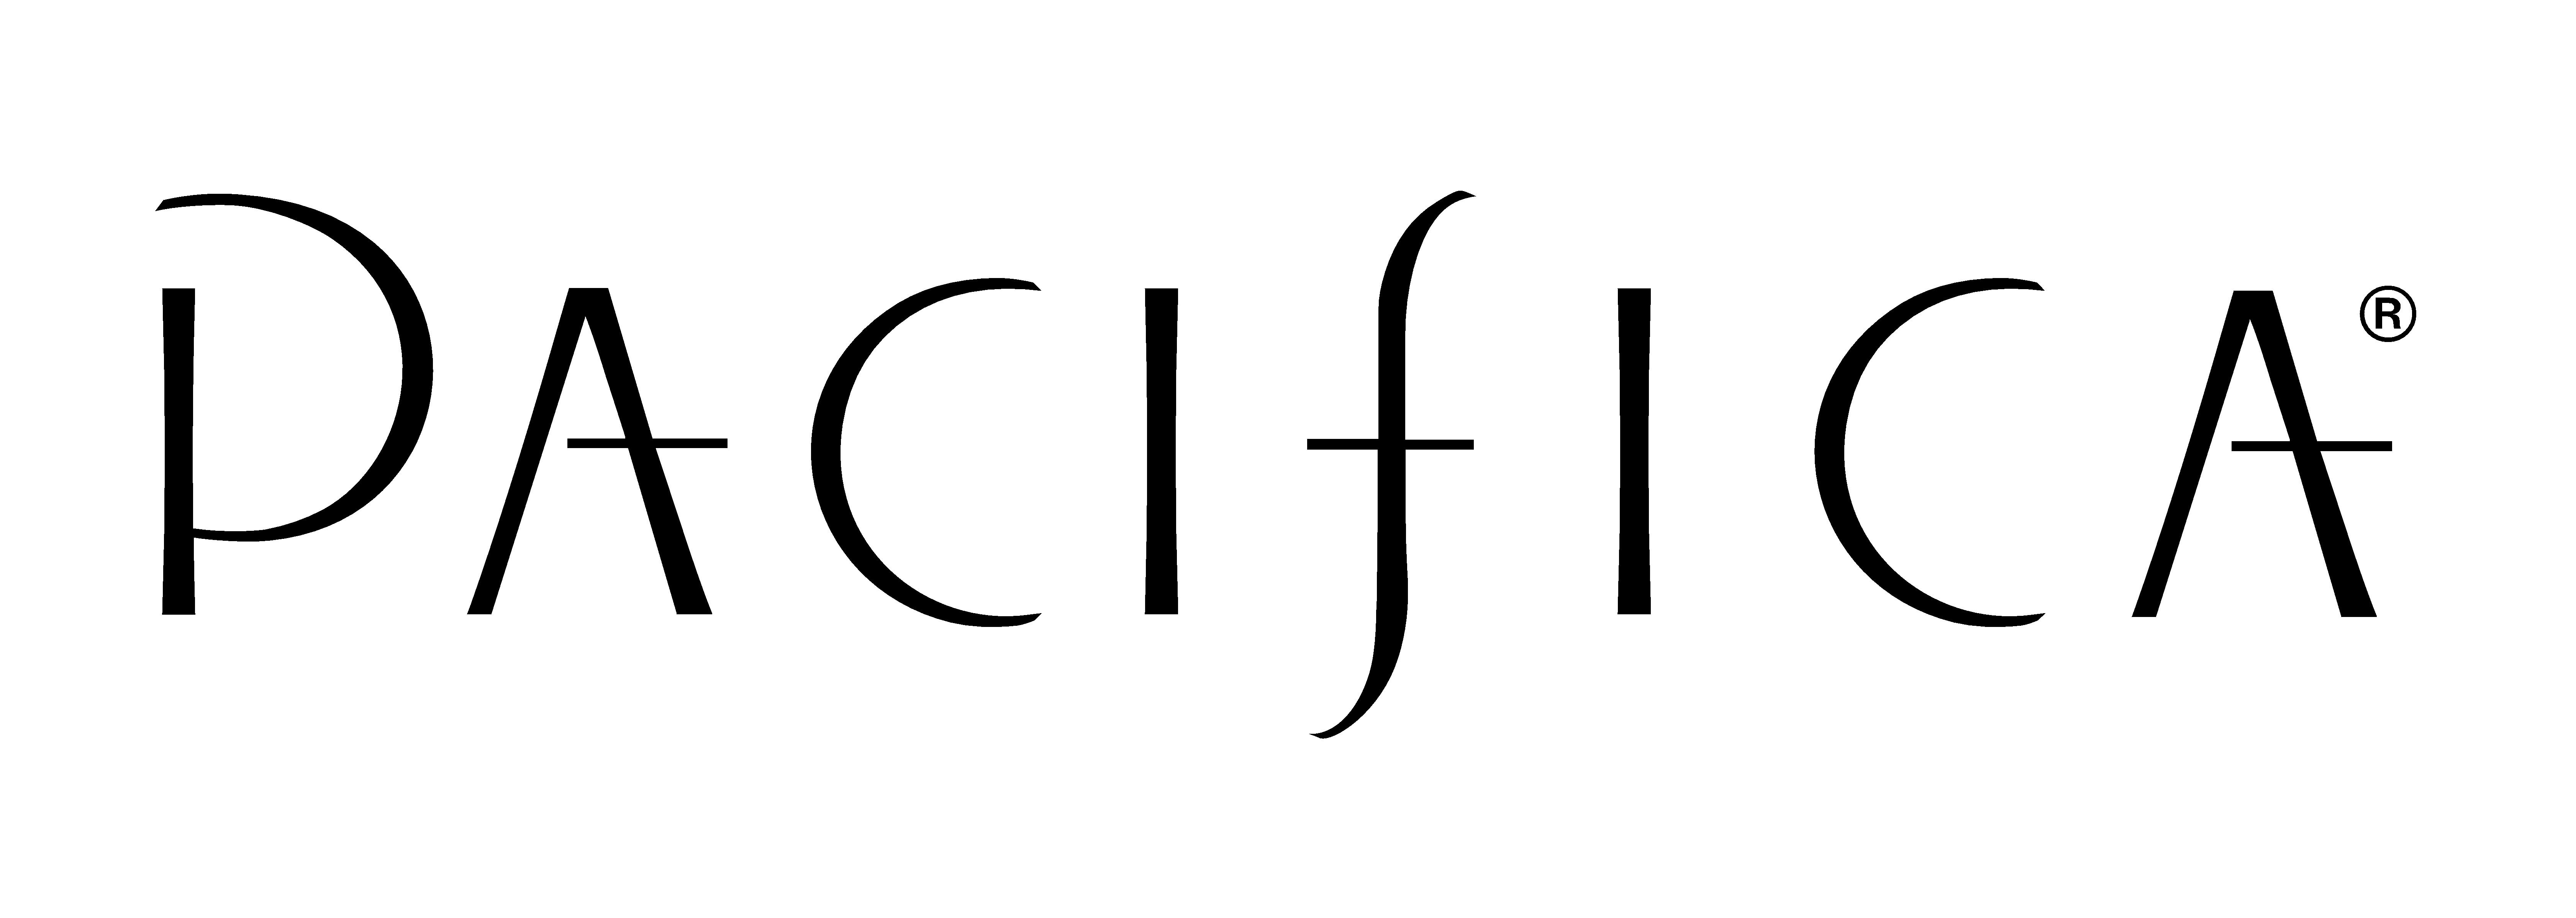 pacifica-logo